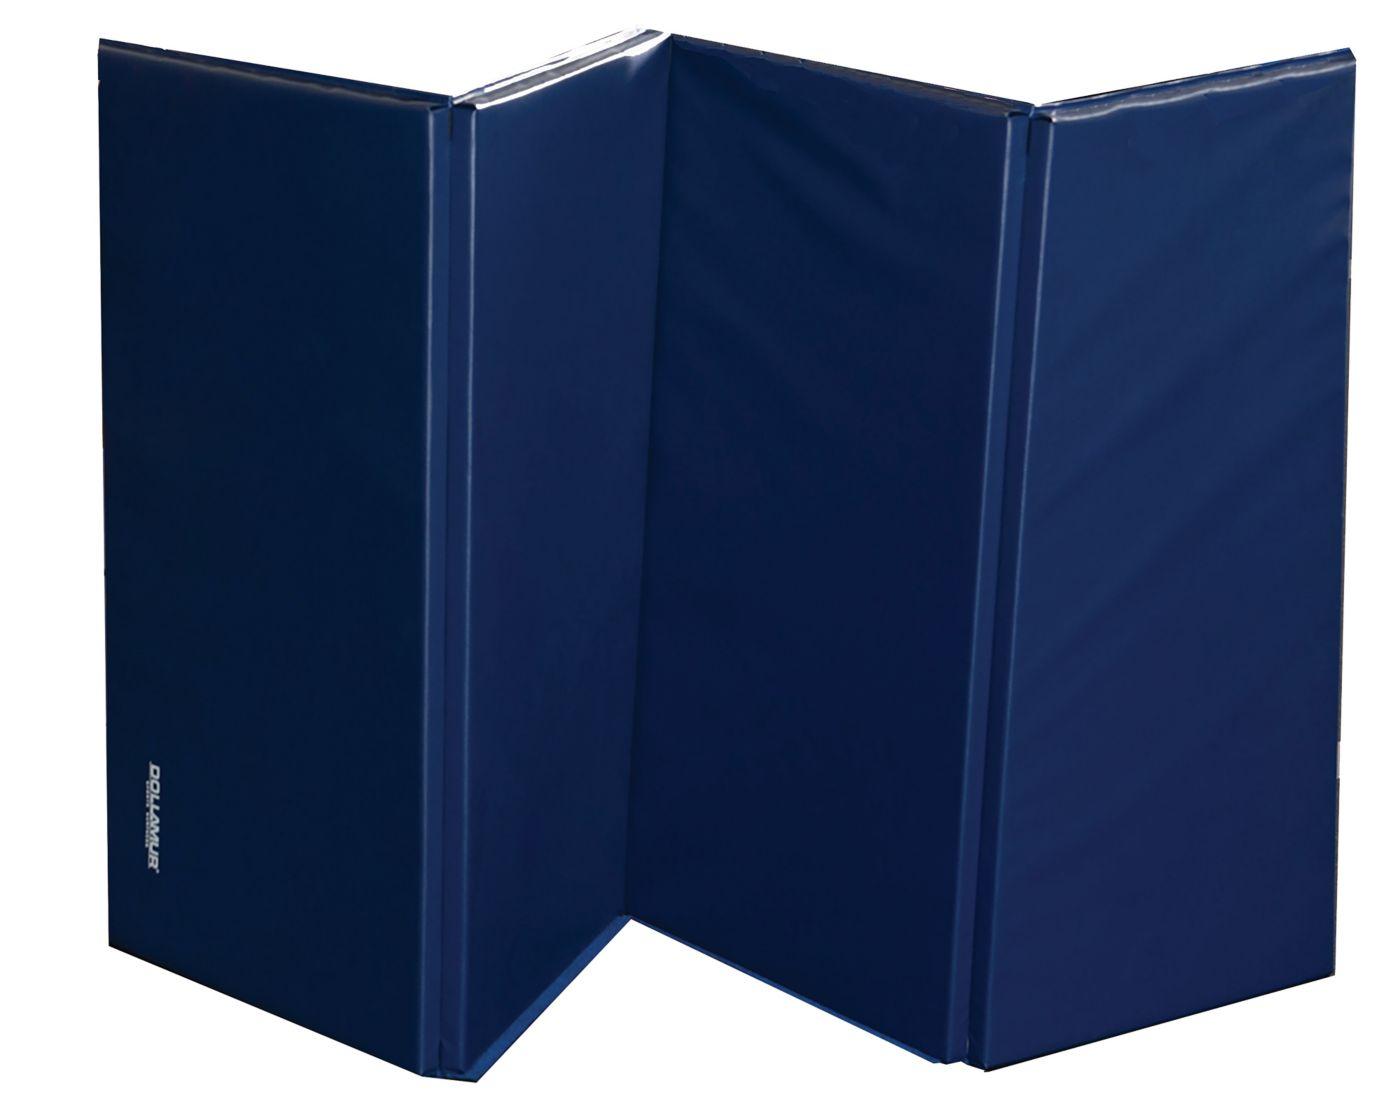 Dollamur Folding Sport Mat 6ft x 12ft